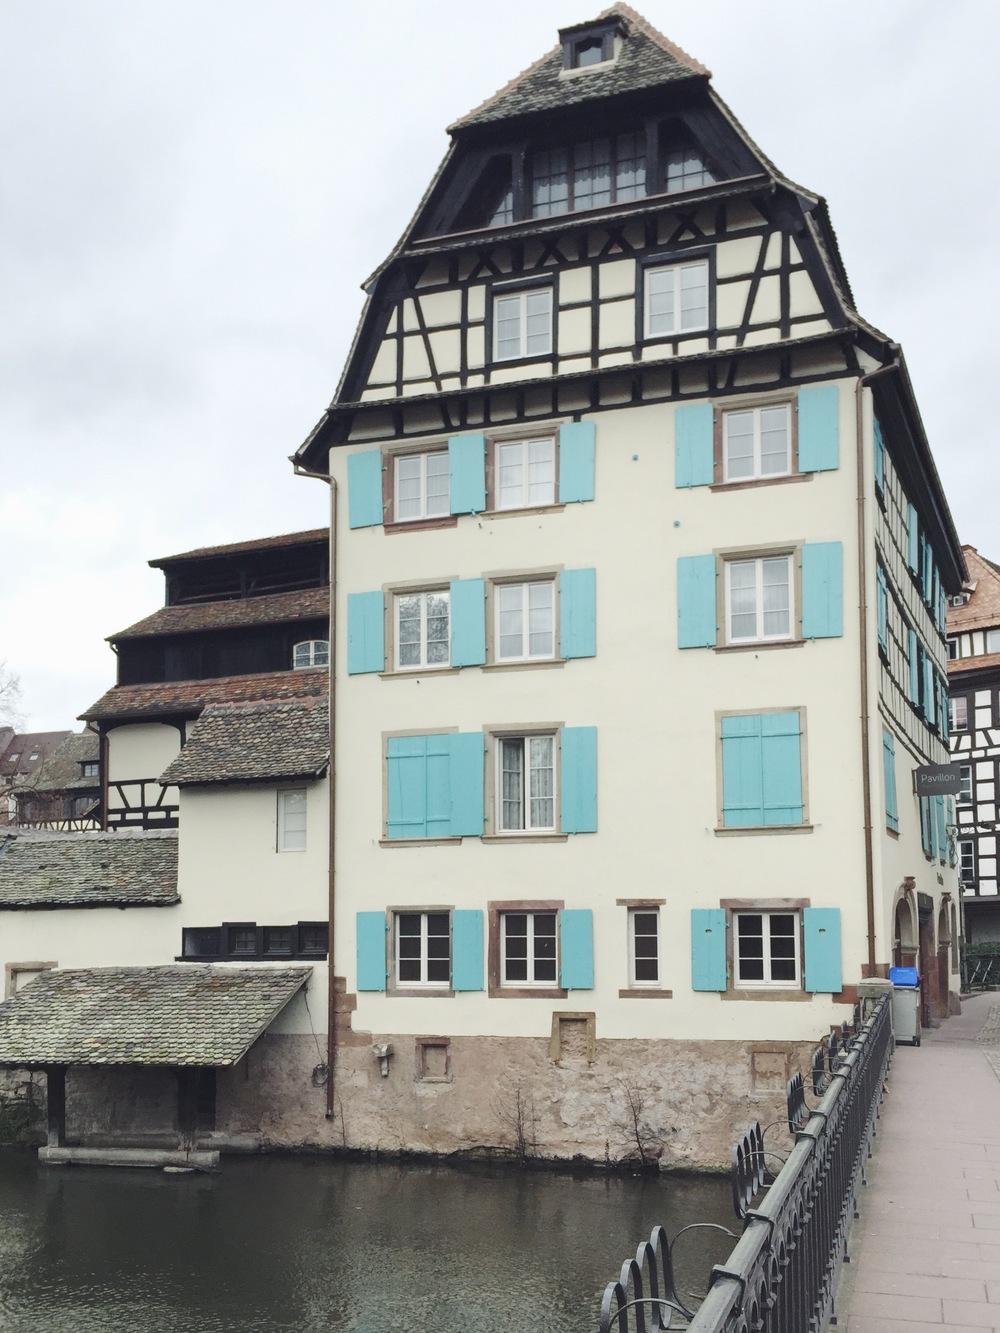 City Centre of Strasbourg,Petite France